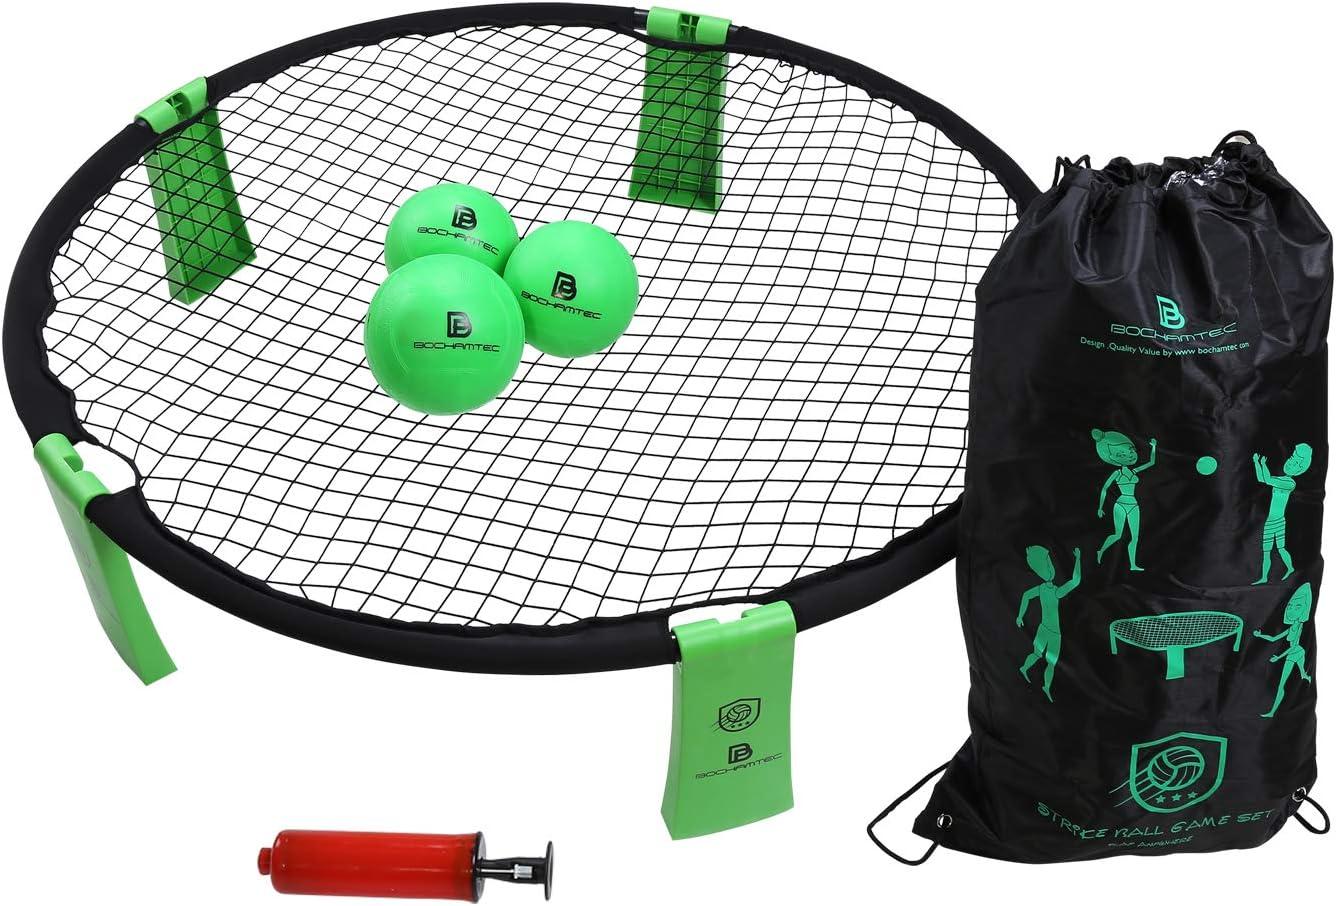 B BOCHAMTEC Strikeball 3 Ball Game Kit - Includes Playing Net, 3 Balls, Carring Bag, Rule Book- Game for Boys, Girls, Teens, Adults, Family(Yellow) … …